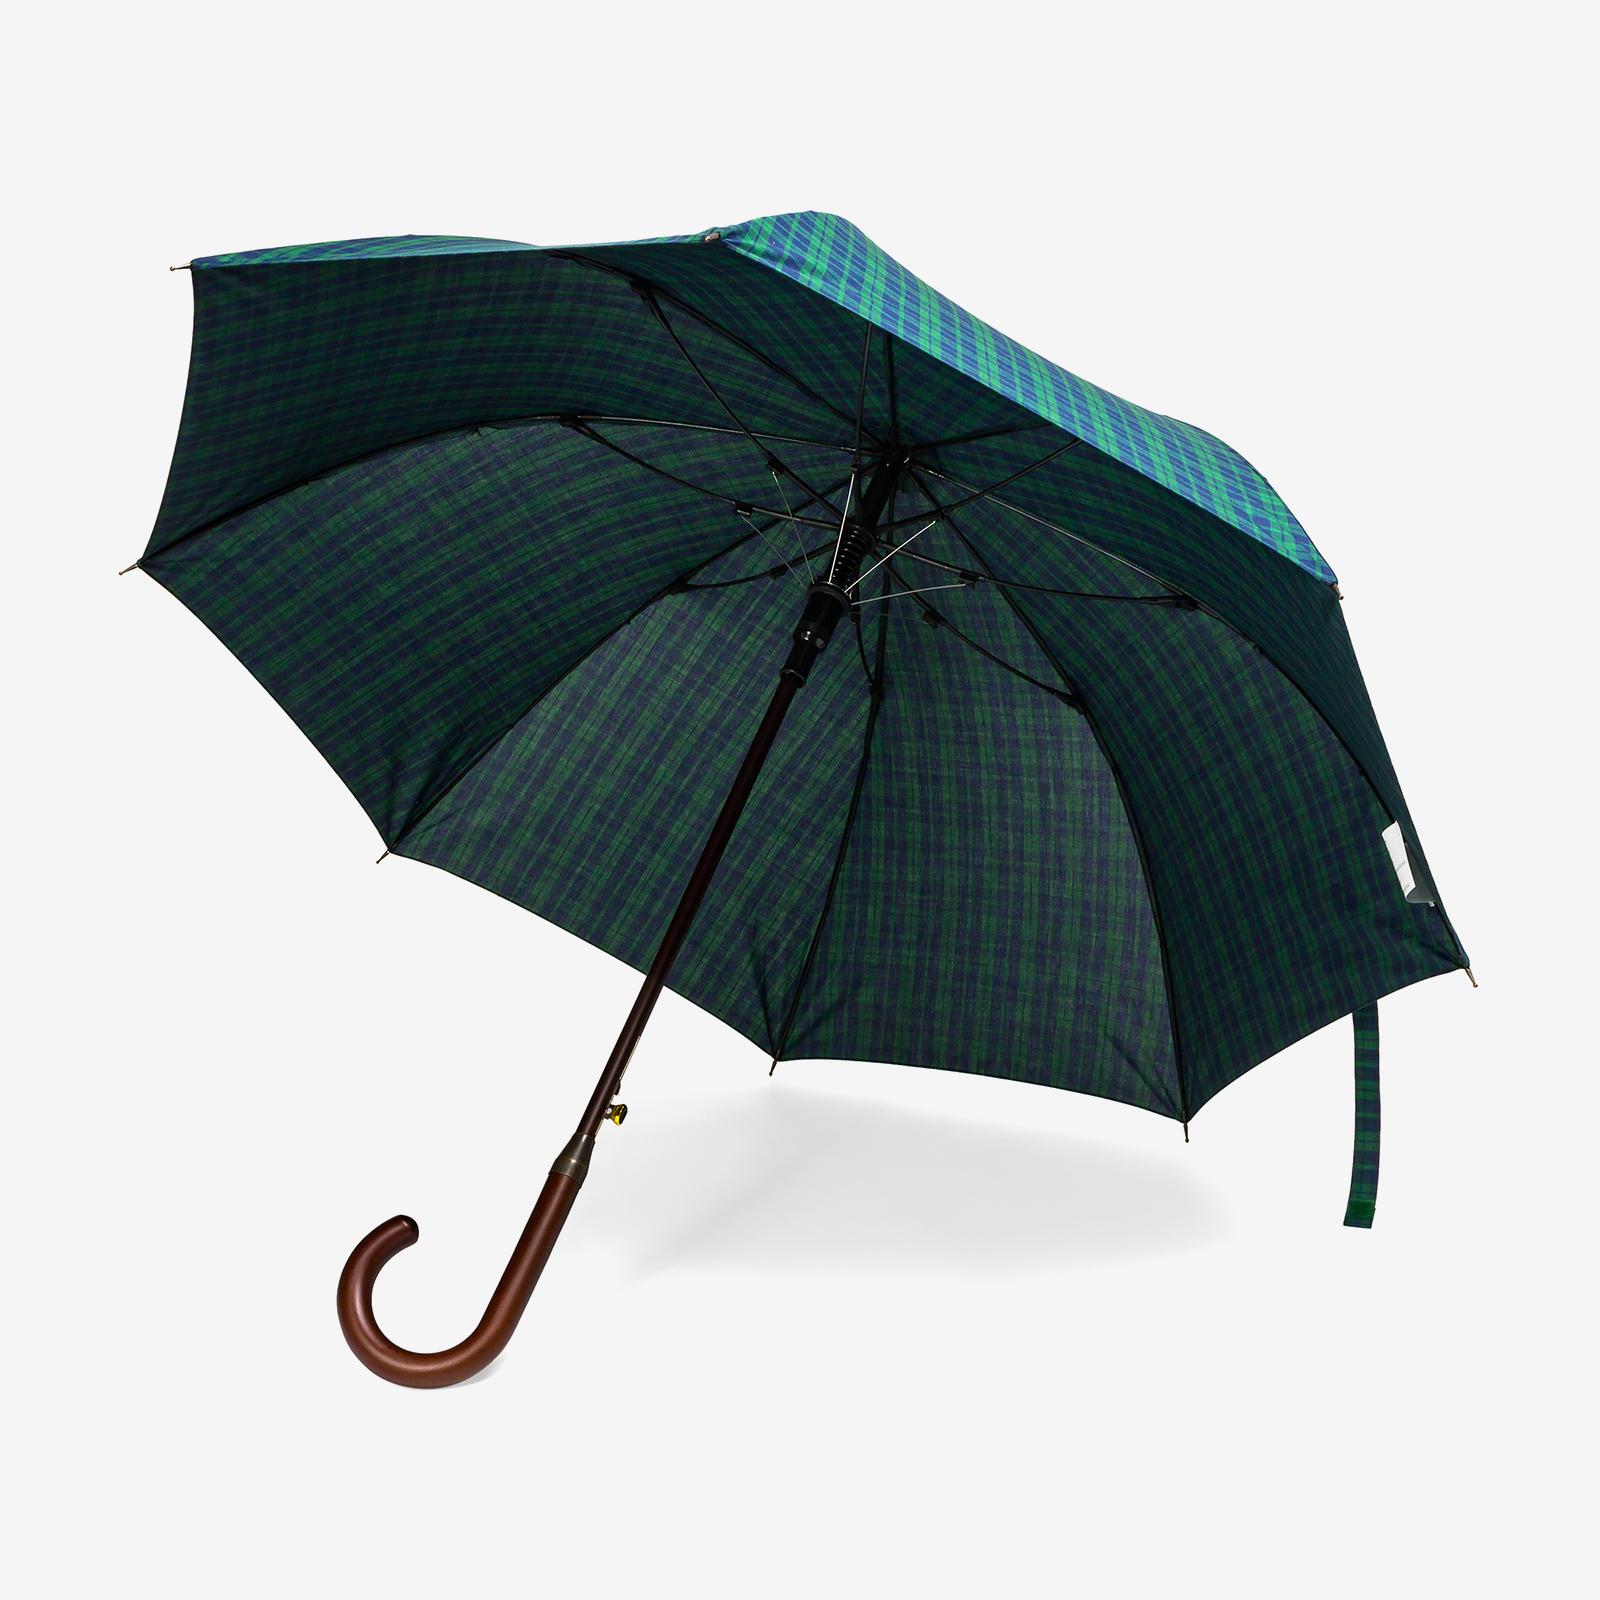 Umbrella product image